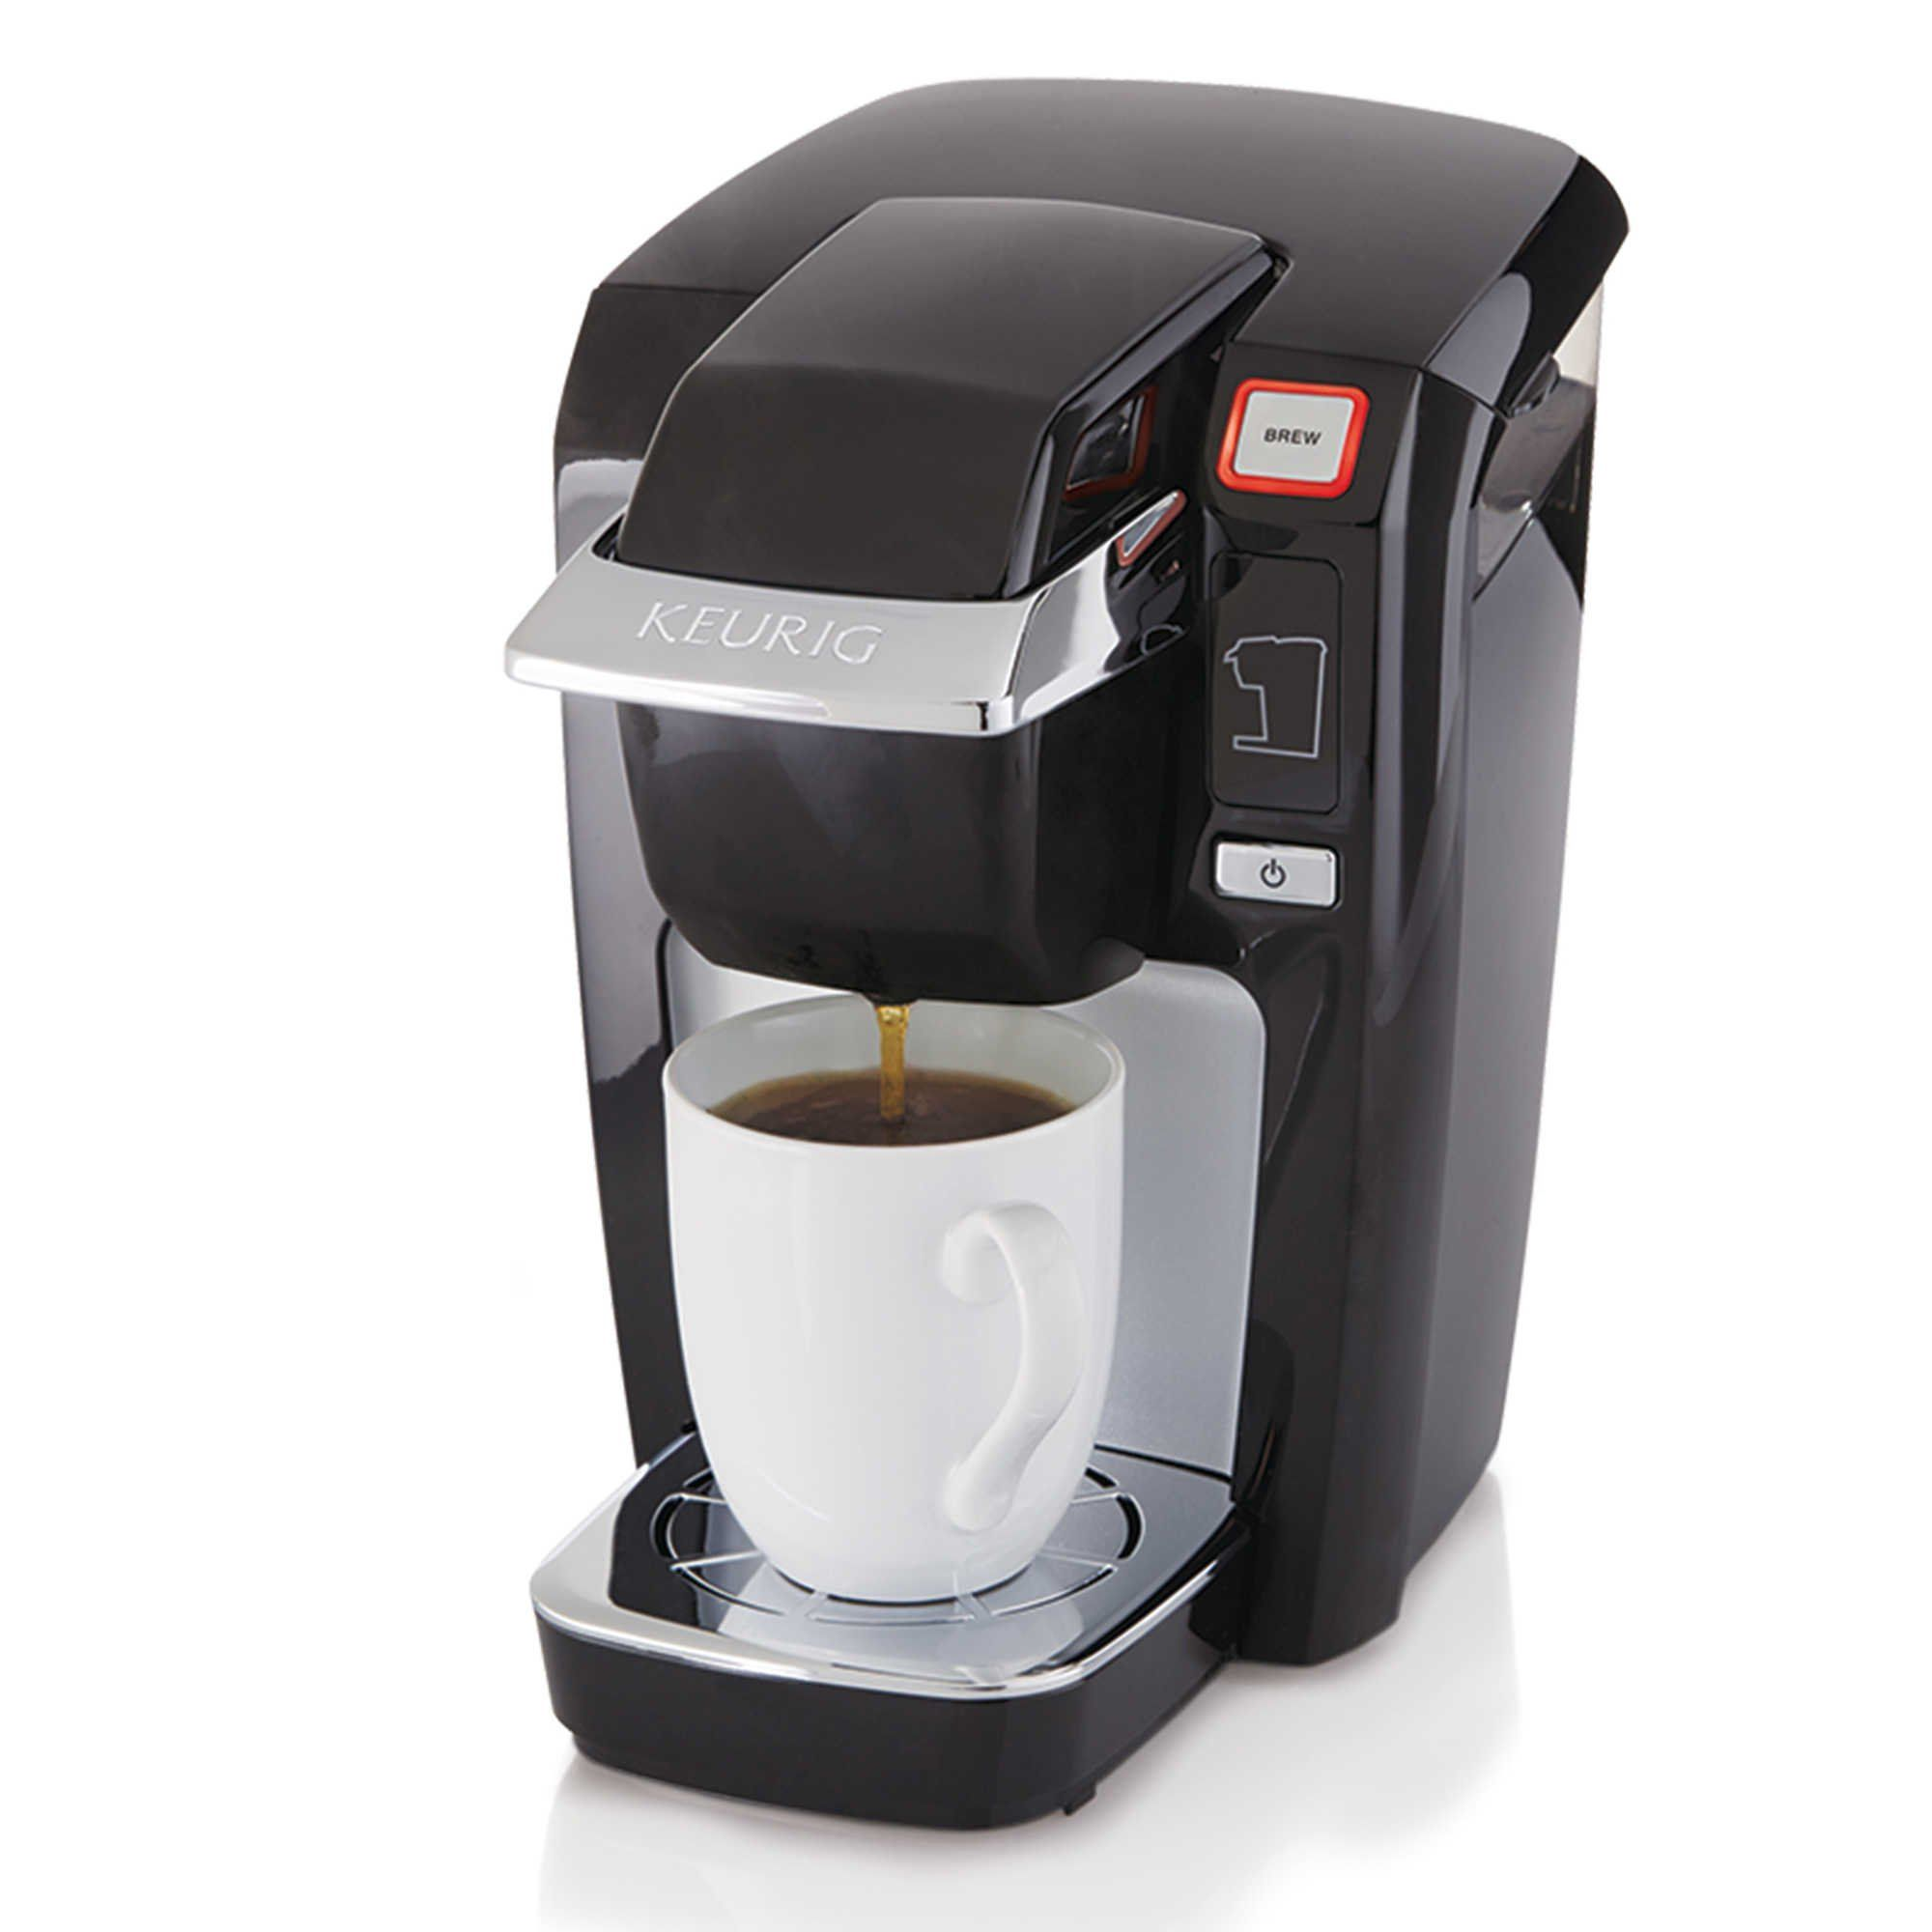 Keurig K10 K15 Brewing System Black Read More Reviews Of The